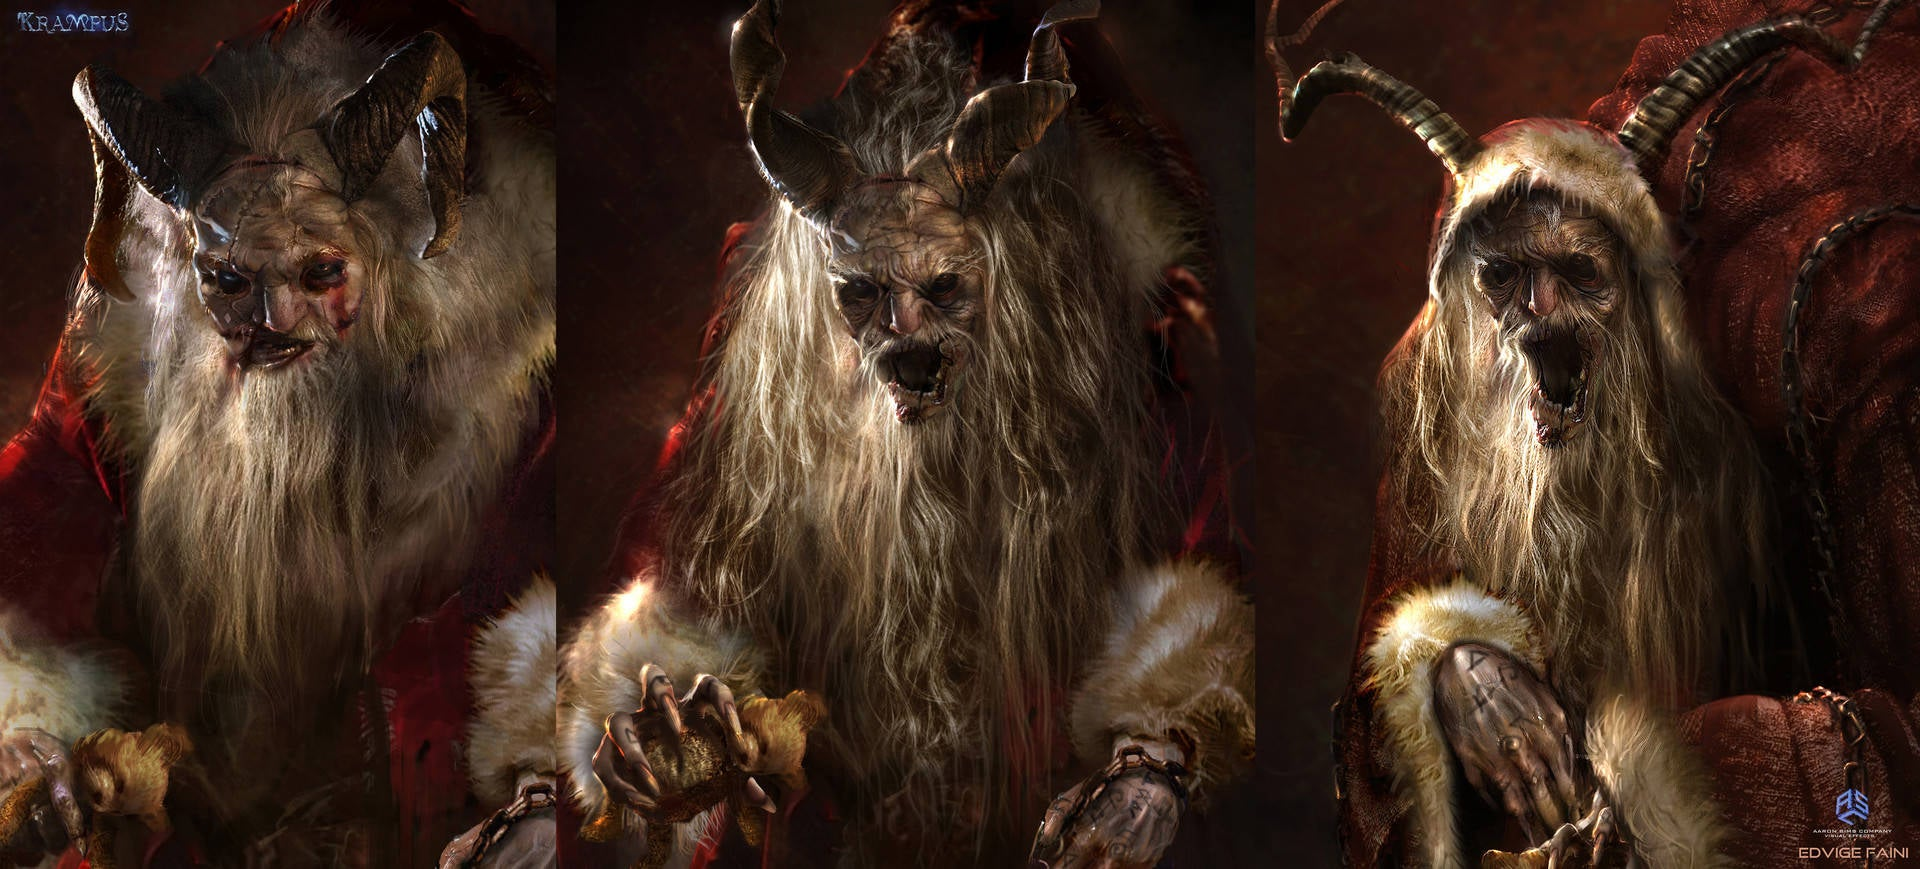 edvige-faini-evolution-of-the-krampus-character-web